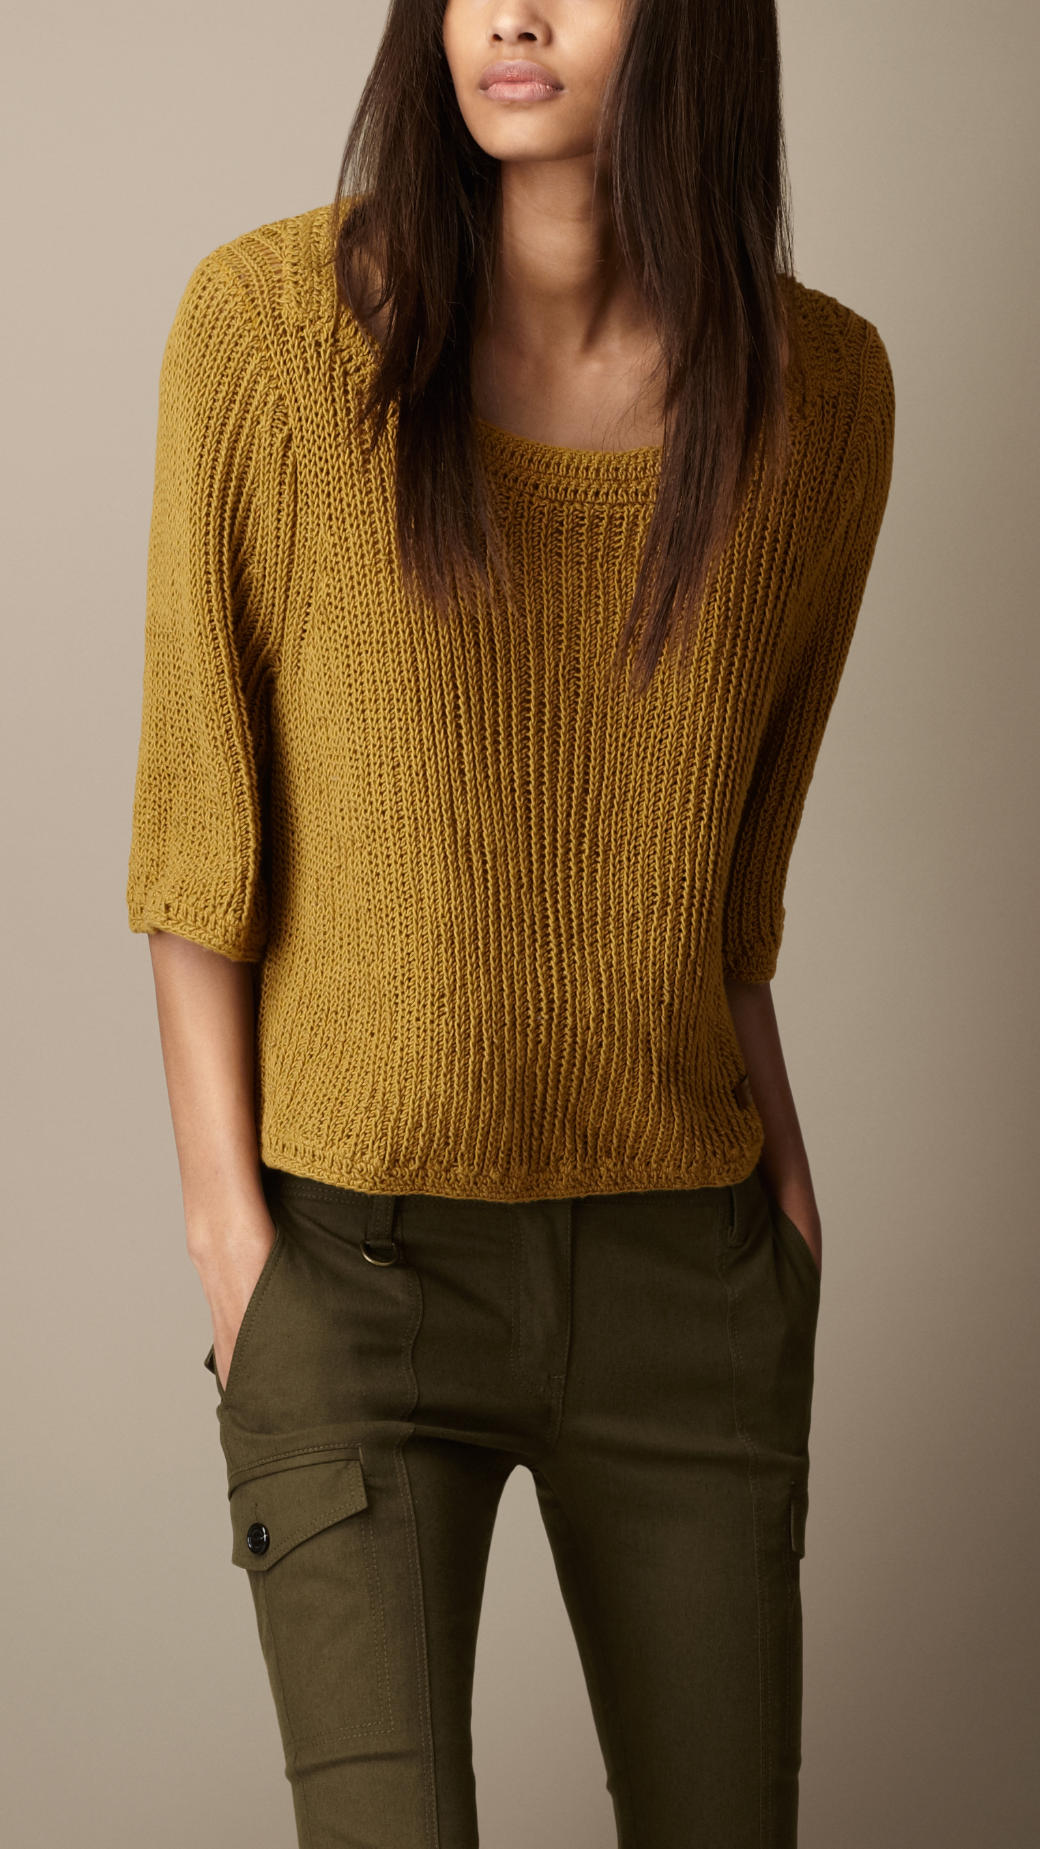 100  [ Mustard Colored Cardigan Sweater ]   1940s Sweater Styles ...